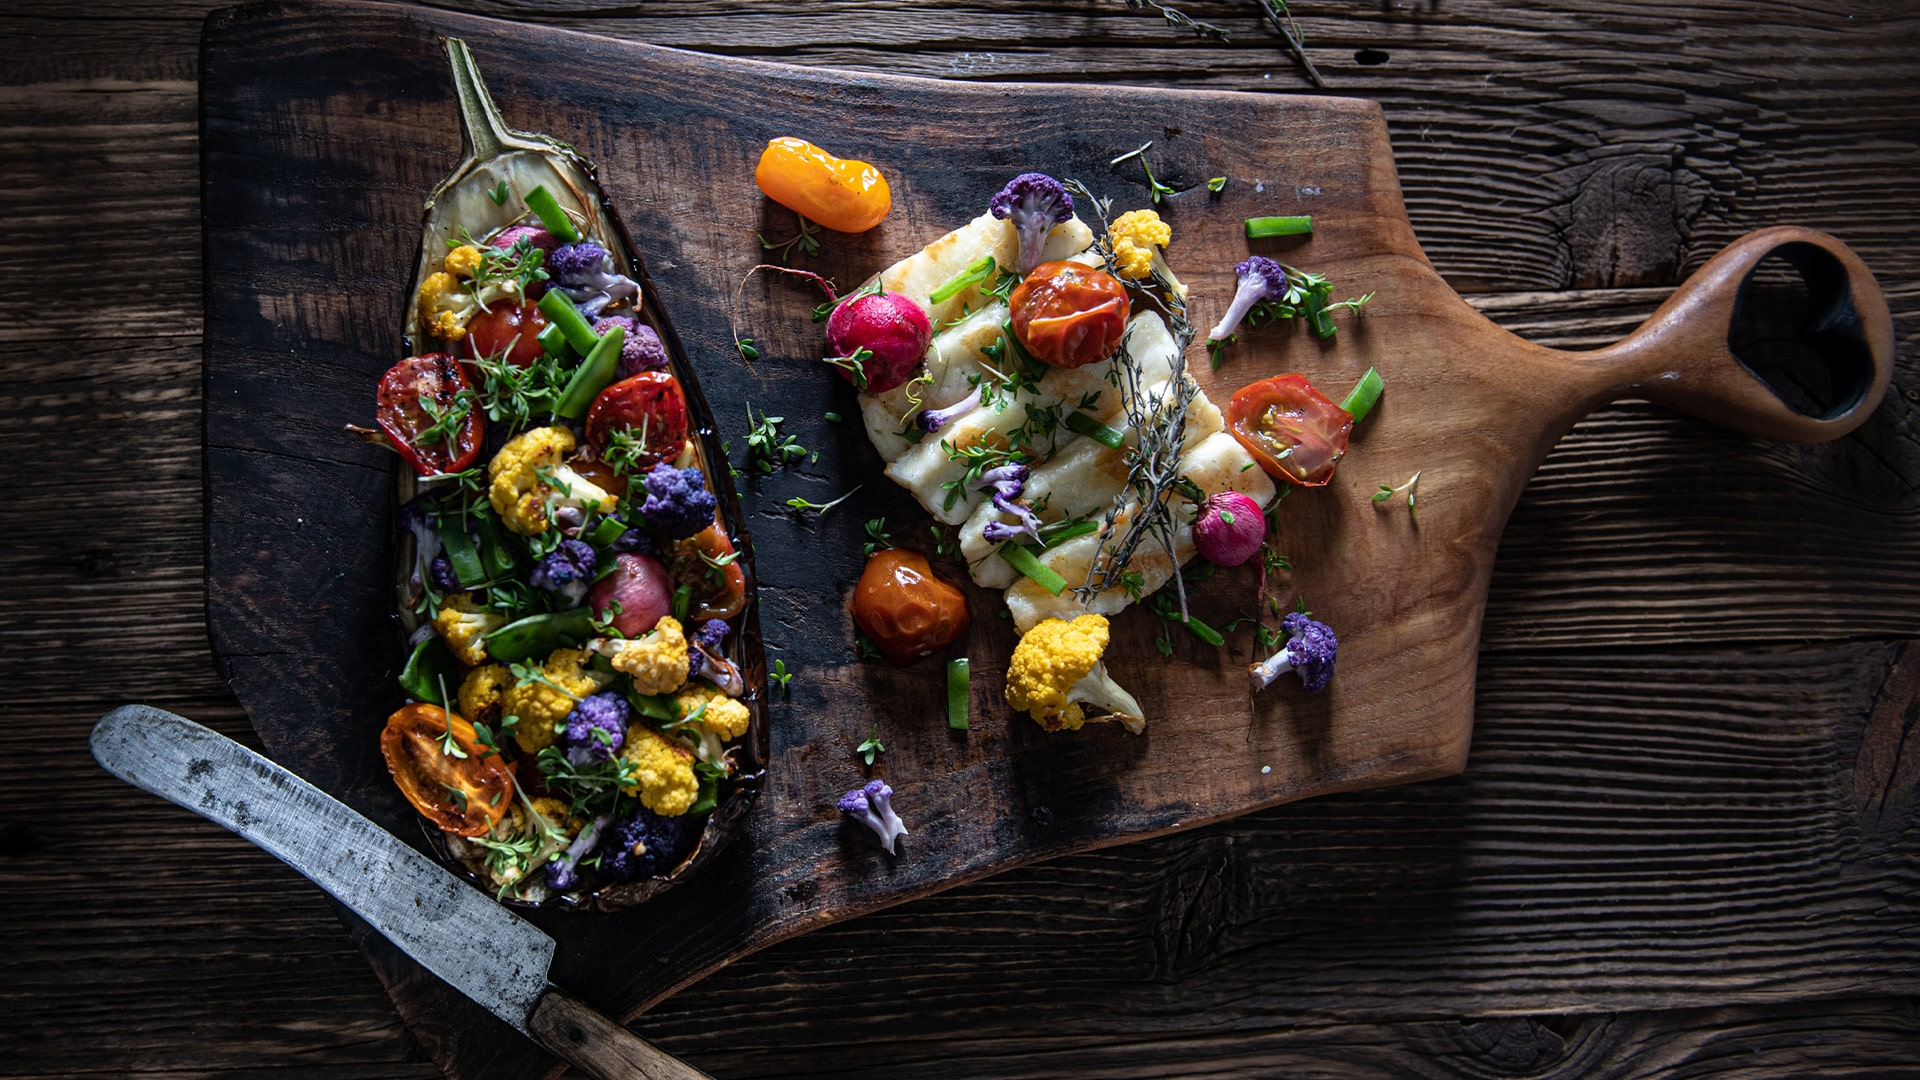 Plnený balkažán s halloumi syrom a grilovanou zeleninou